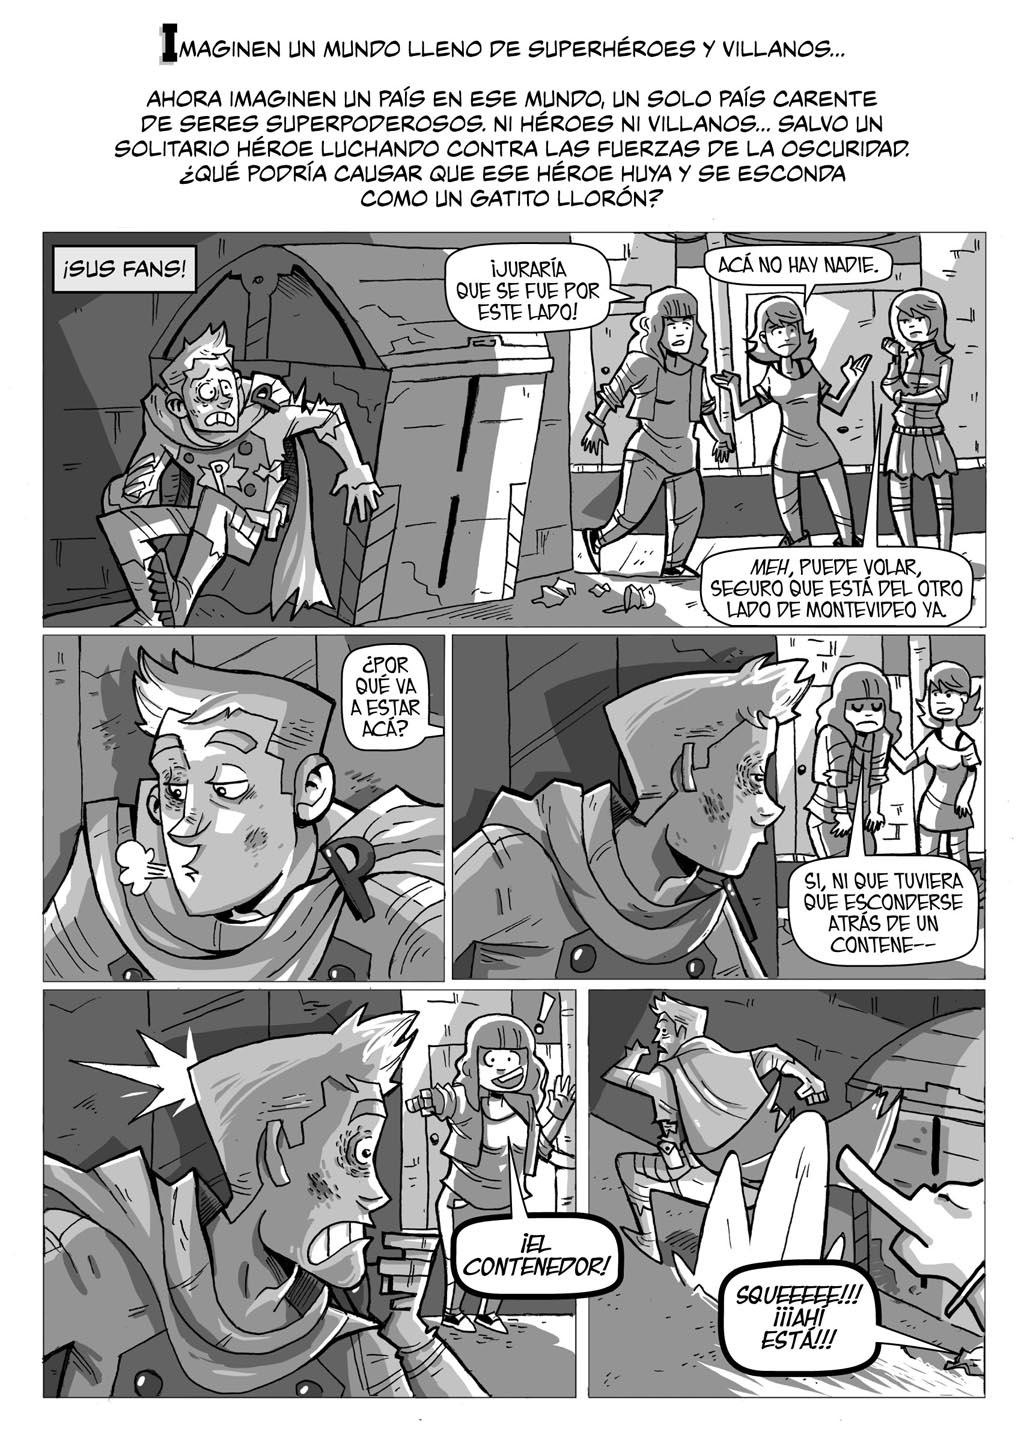 Portento - Página 1